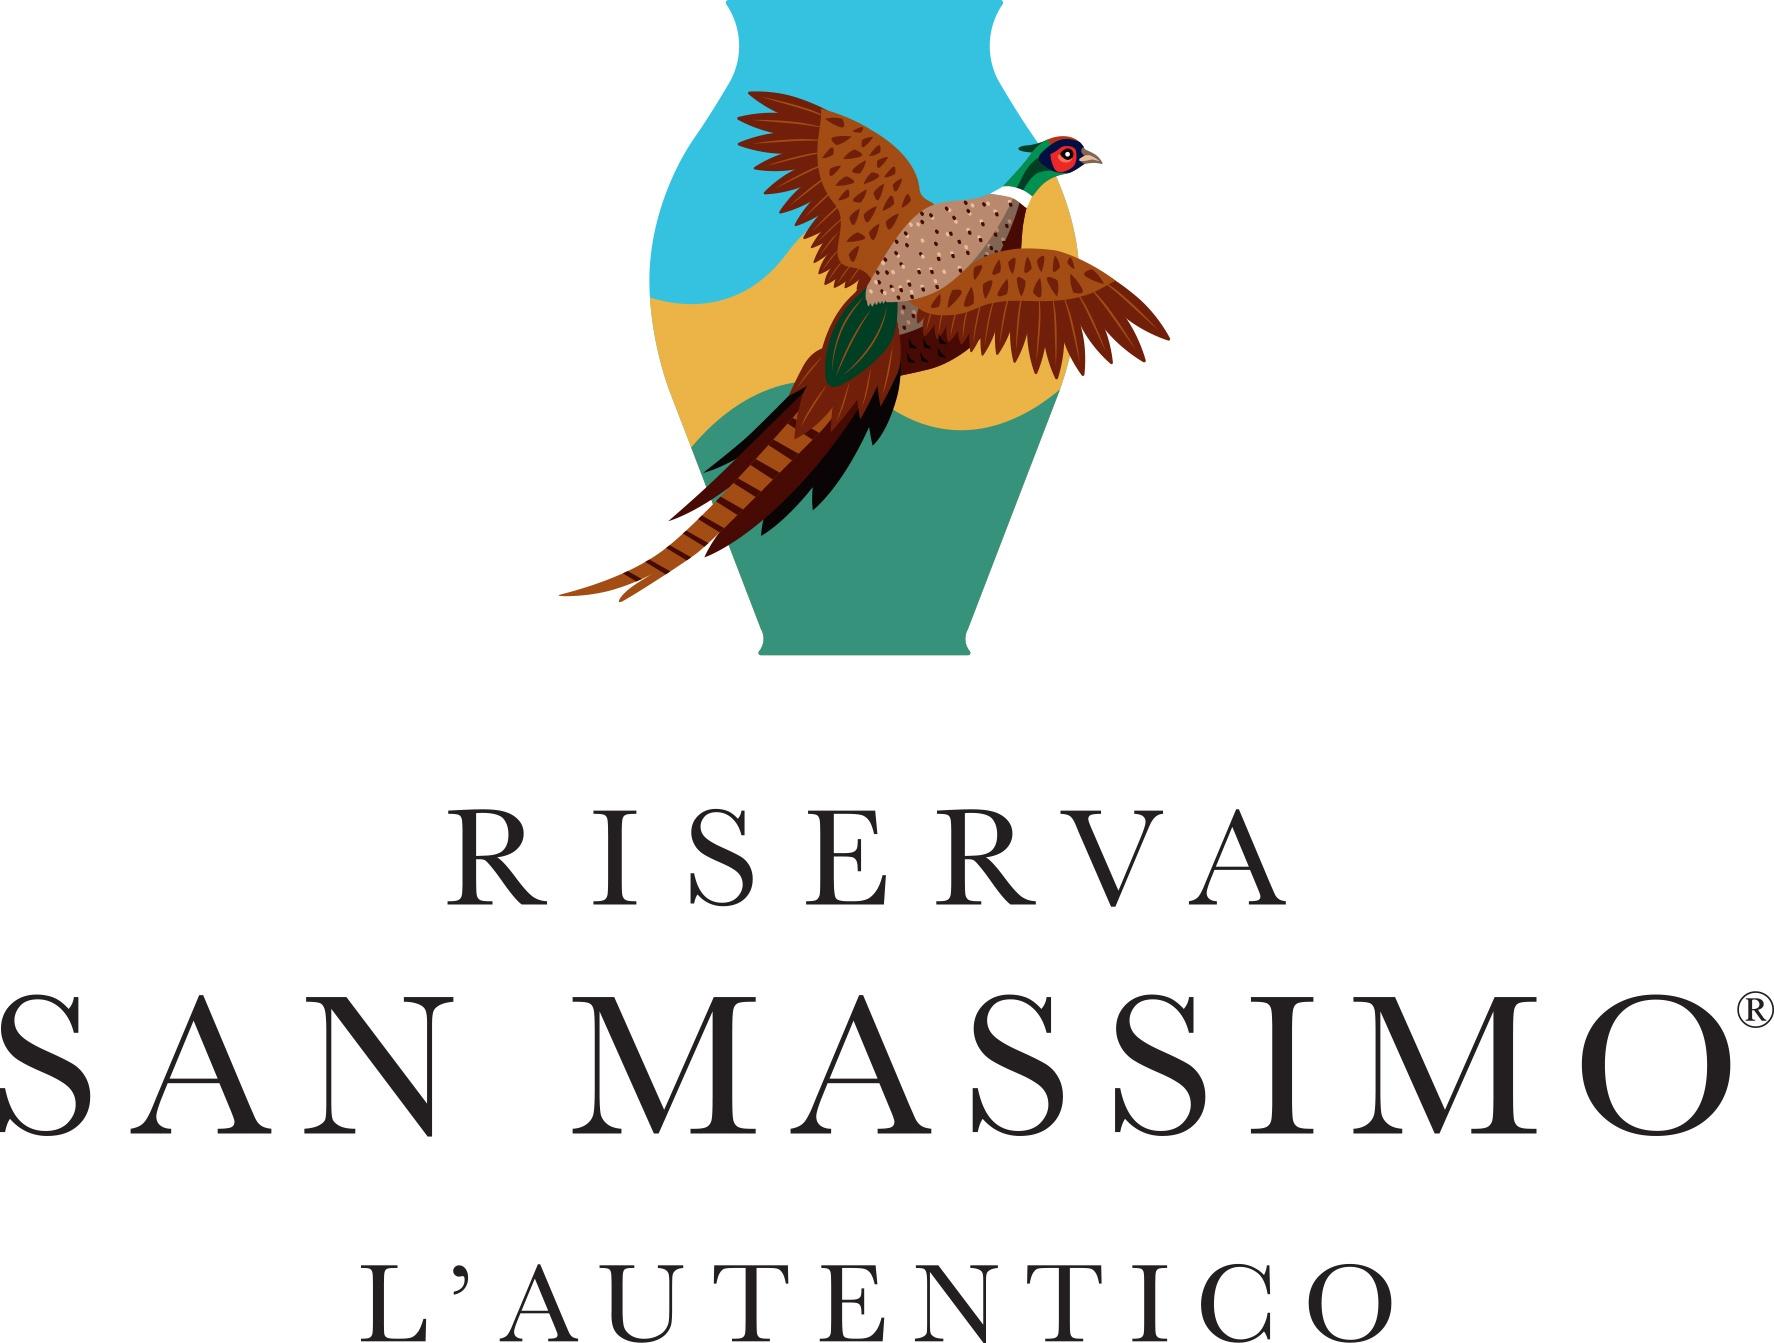 Riserva San Massimo